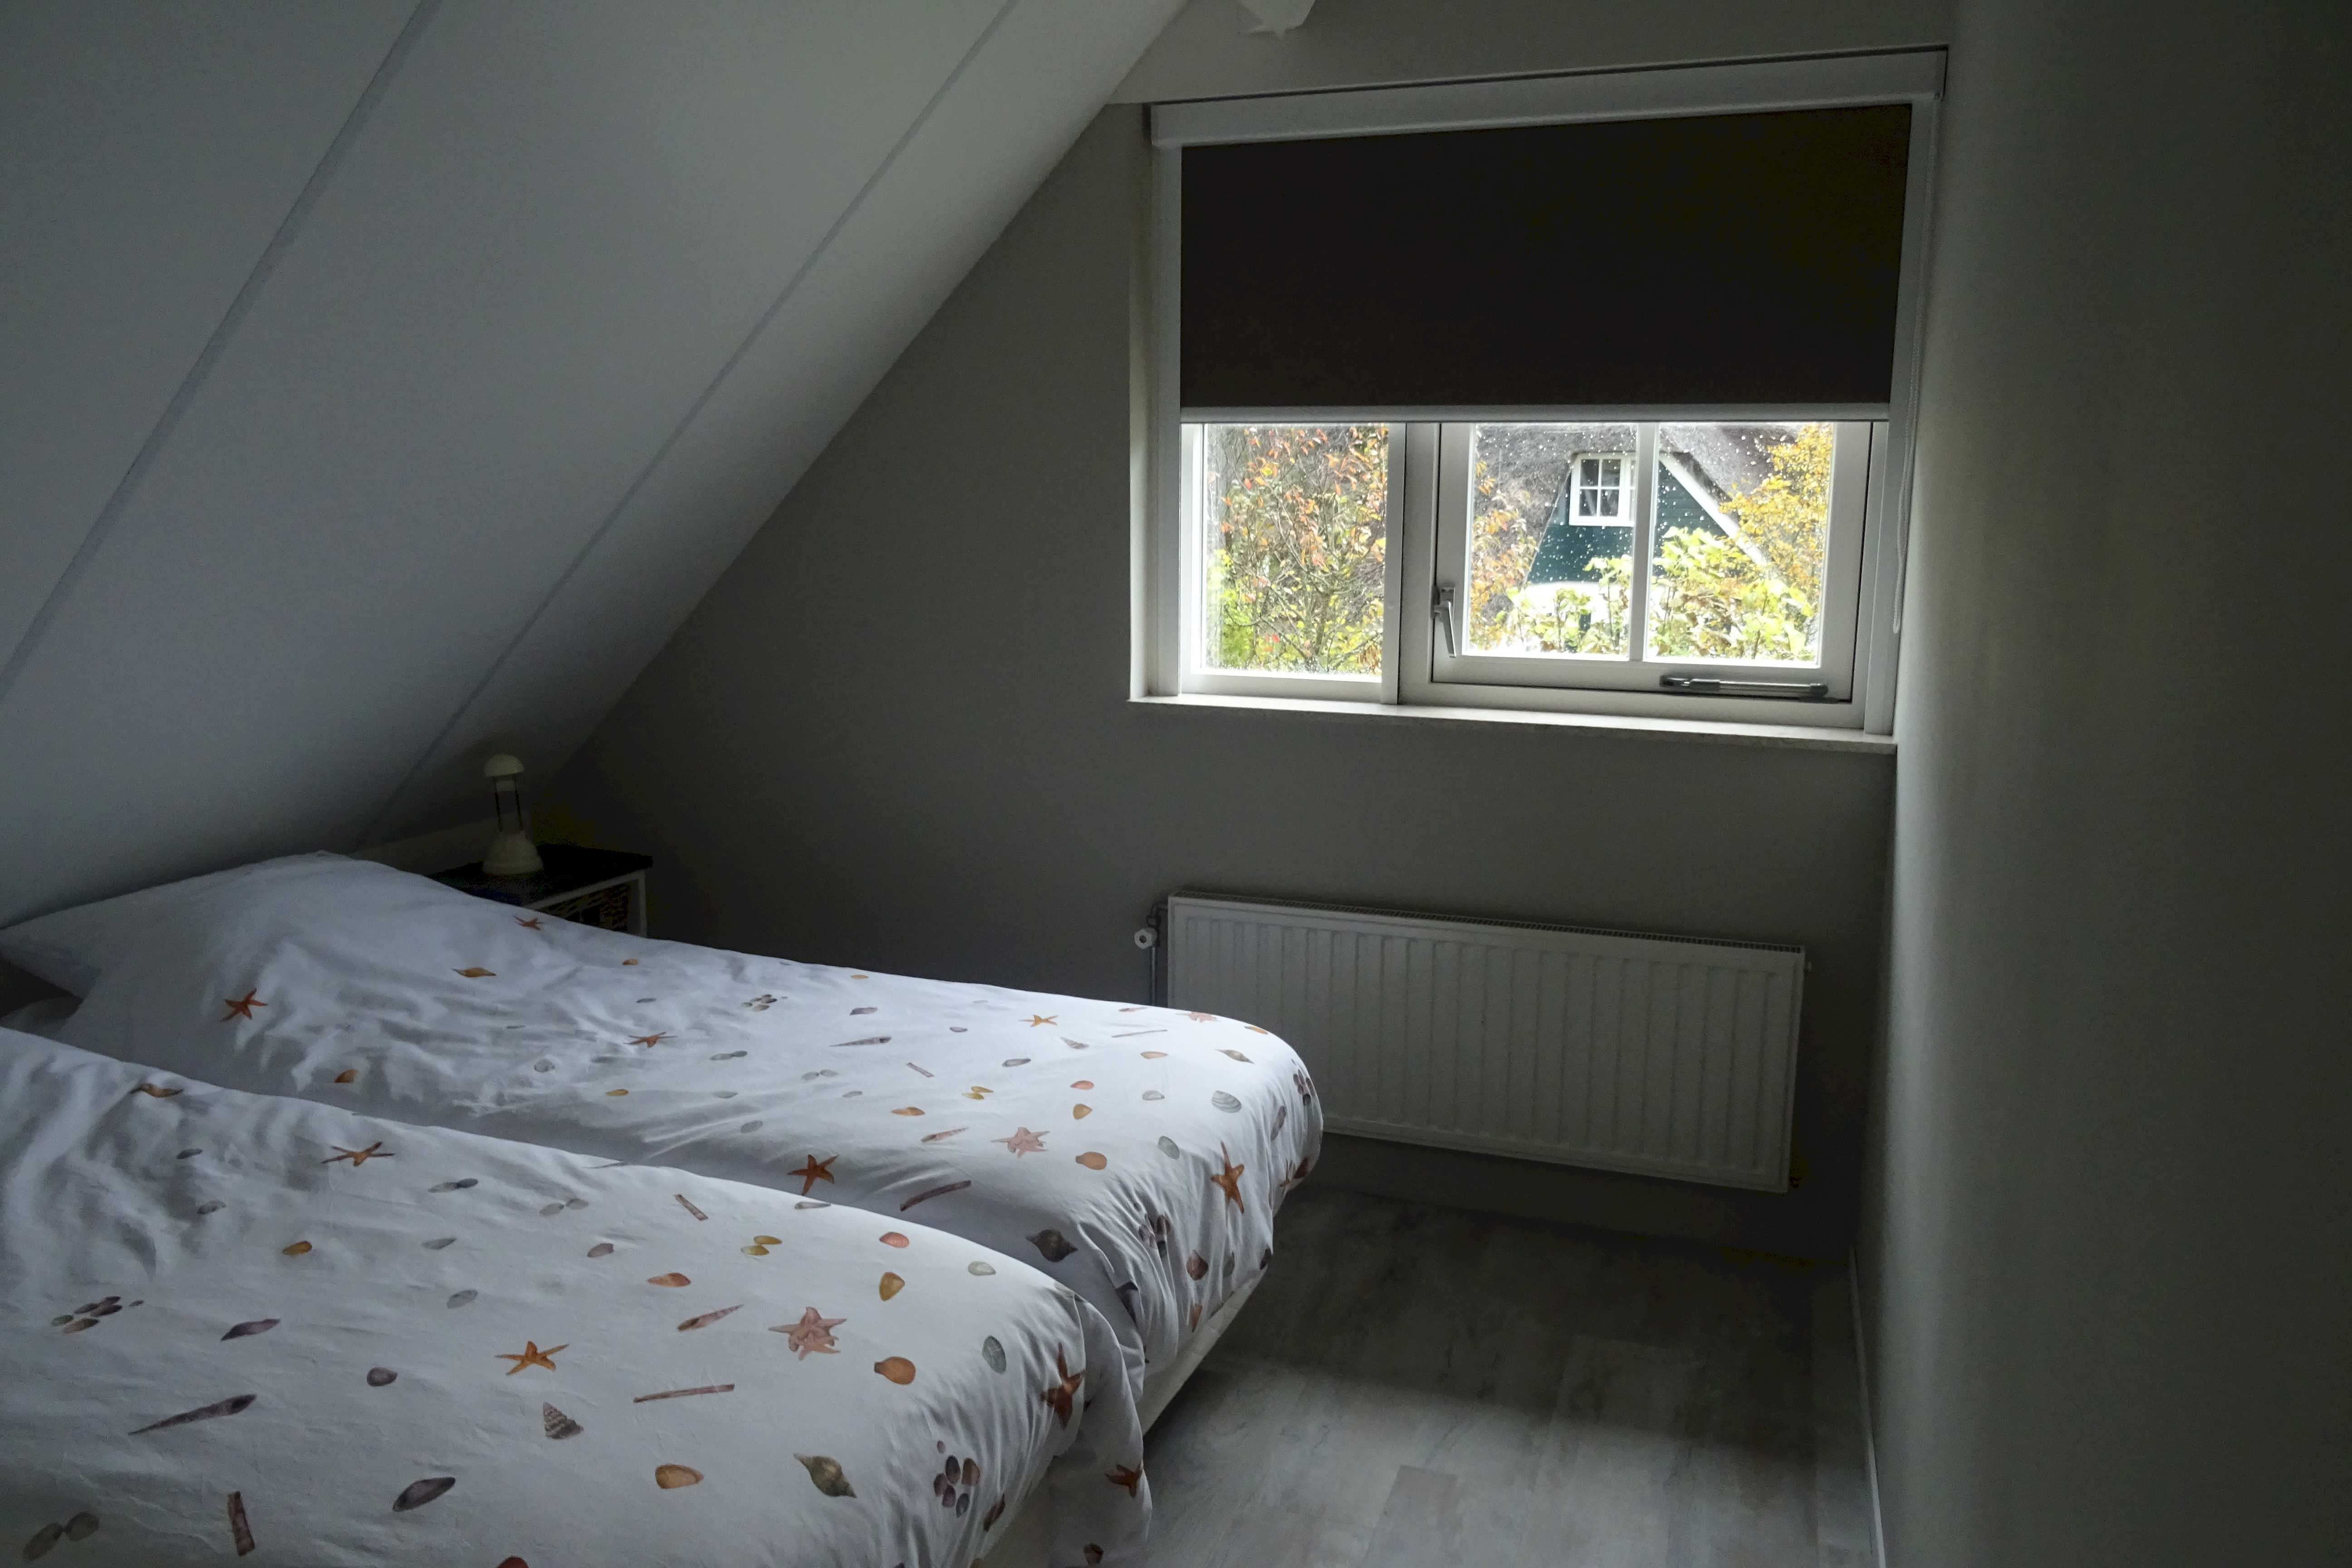 bedden-slaapkamer-2-villa-burghduin